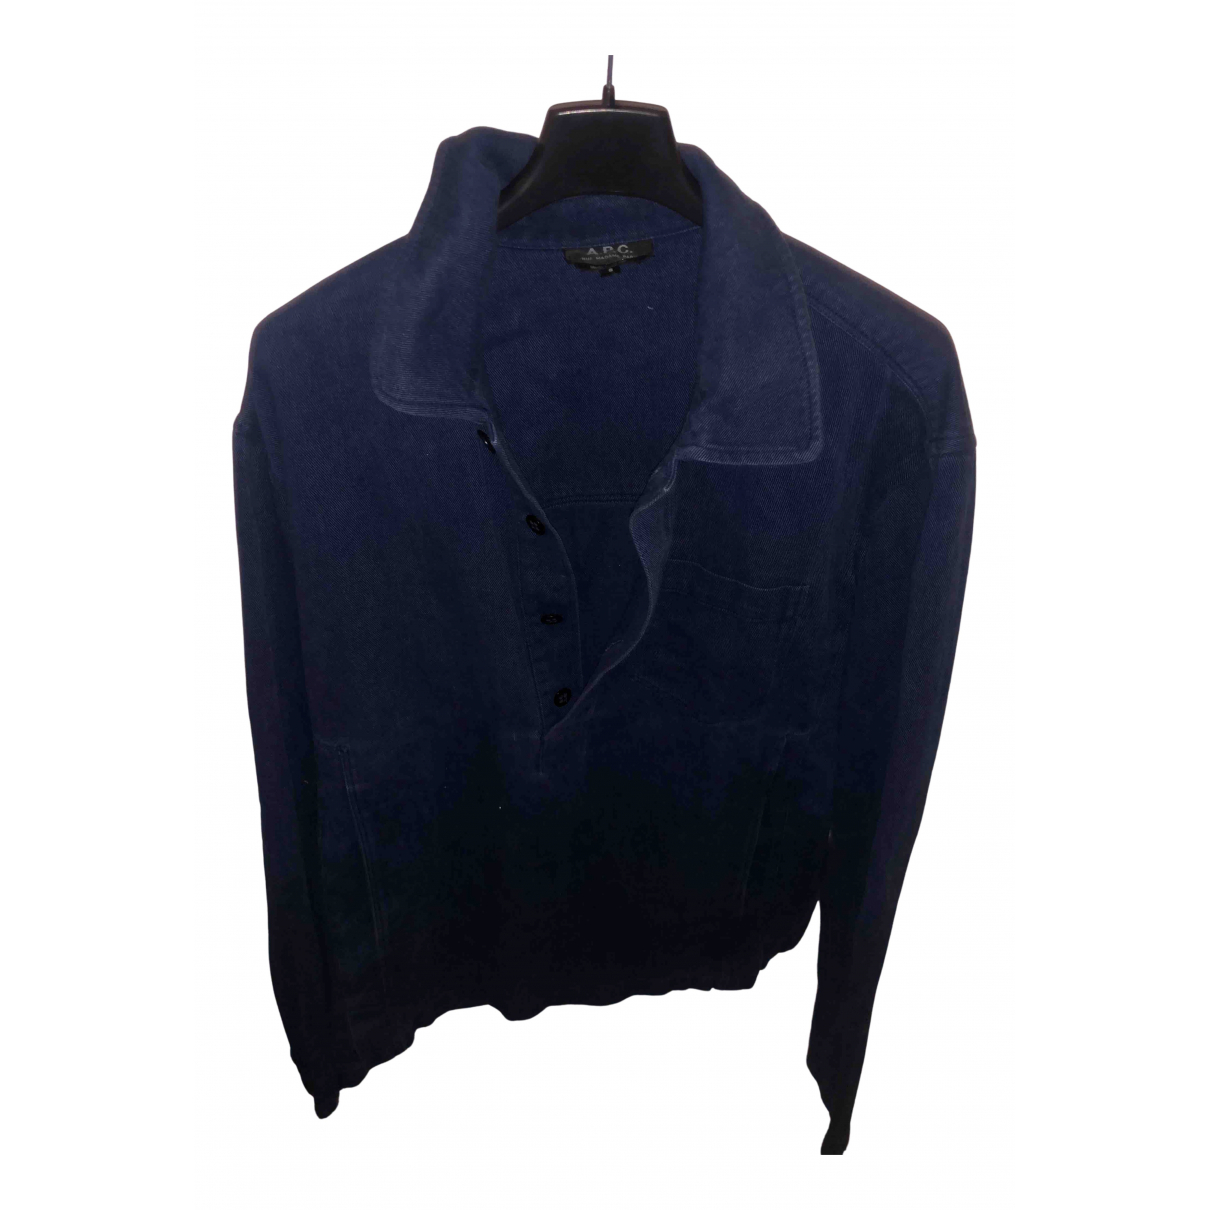 Apc - Top   pour femme en denim - bleu